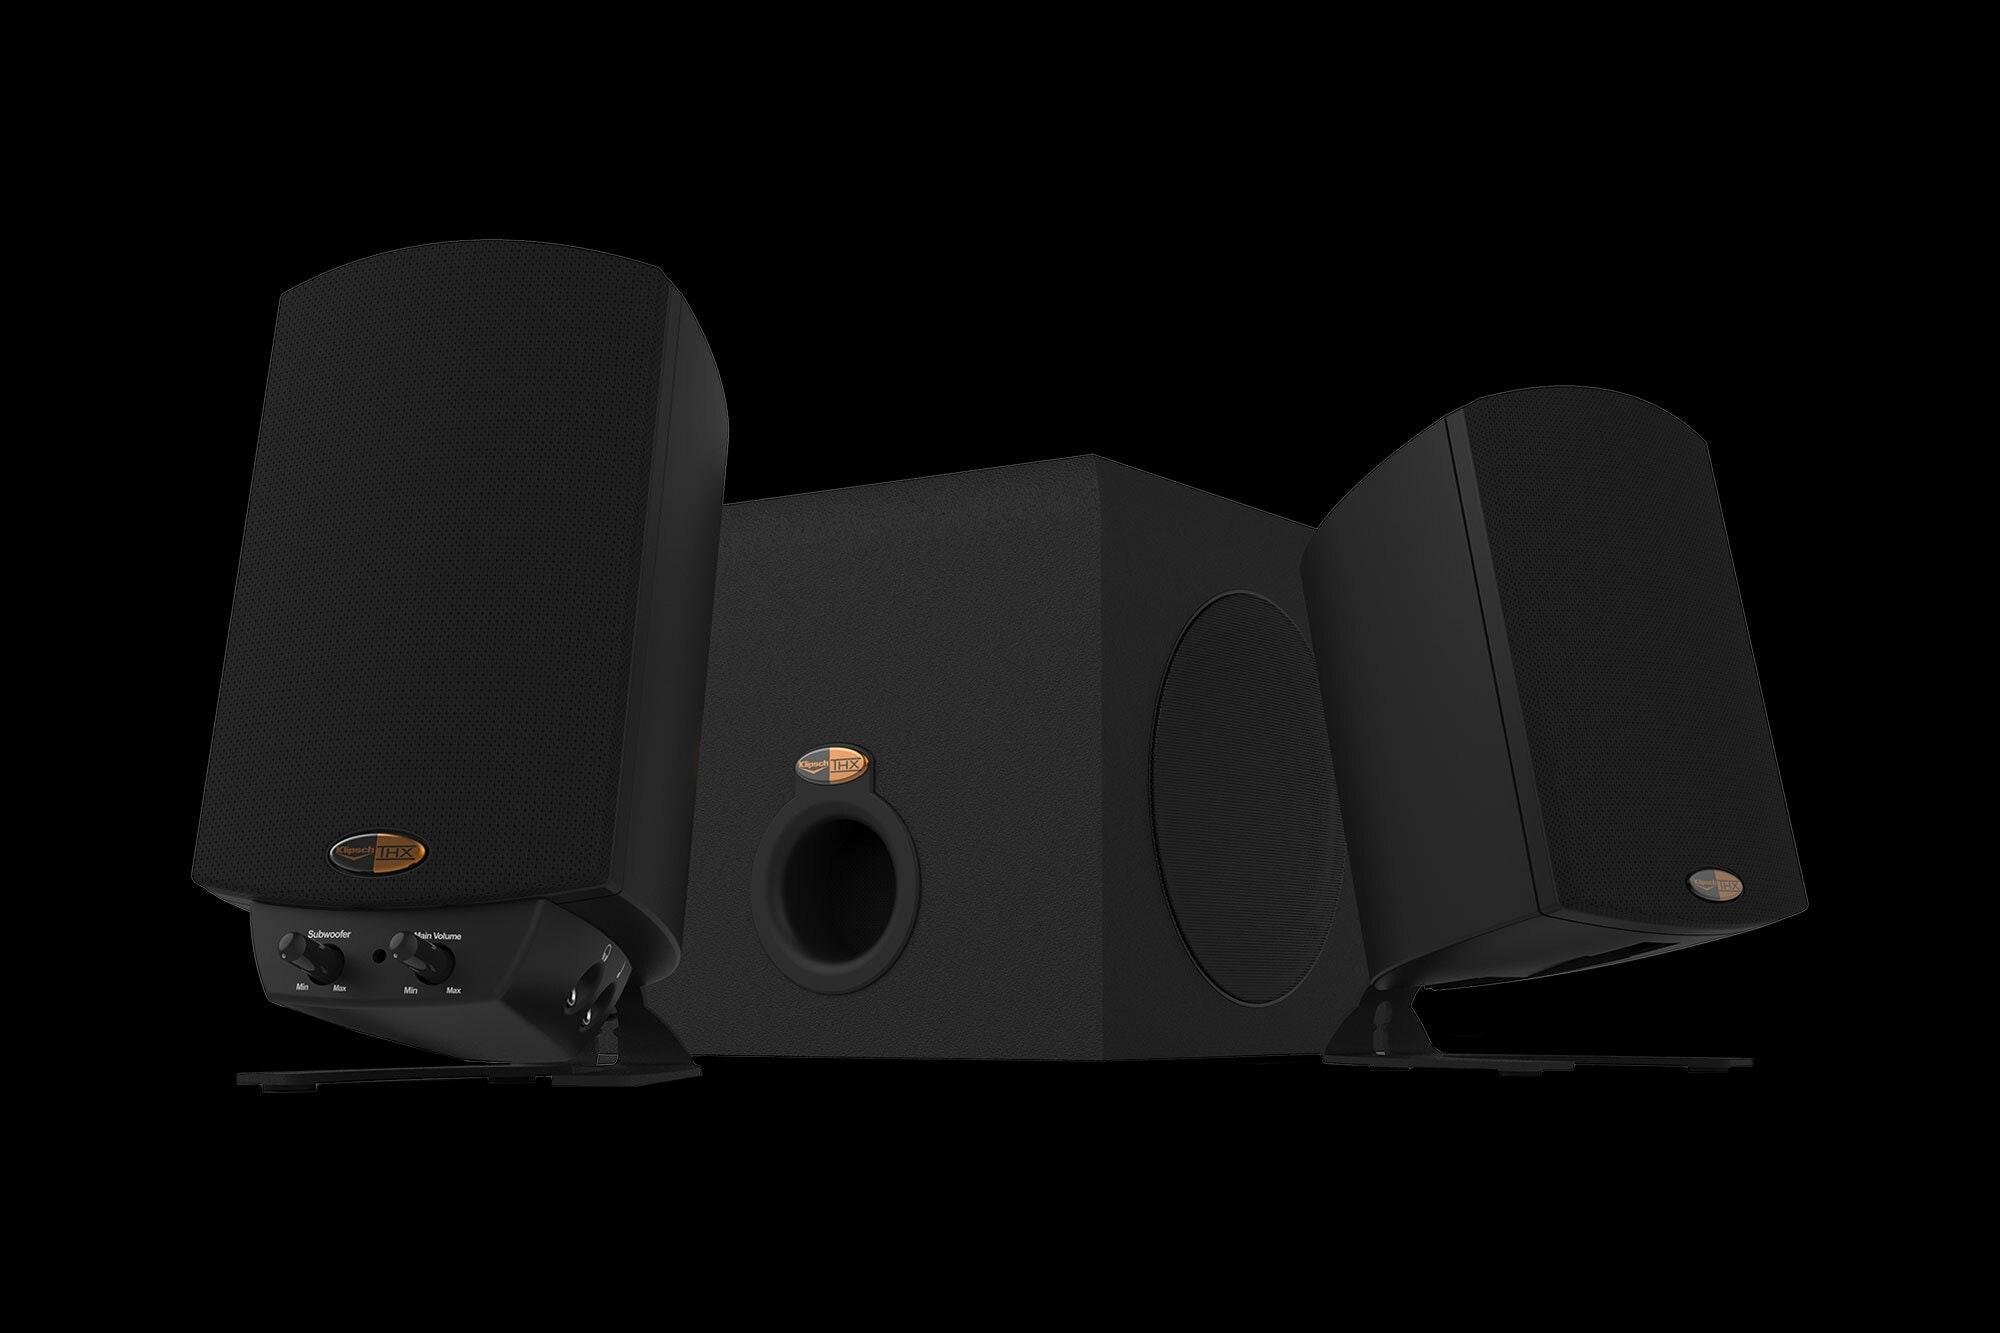 Klipsch Pro Media 21 THX best computer speakers on black